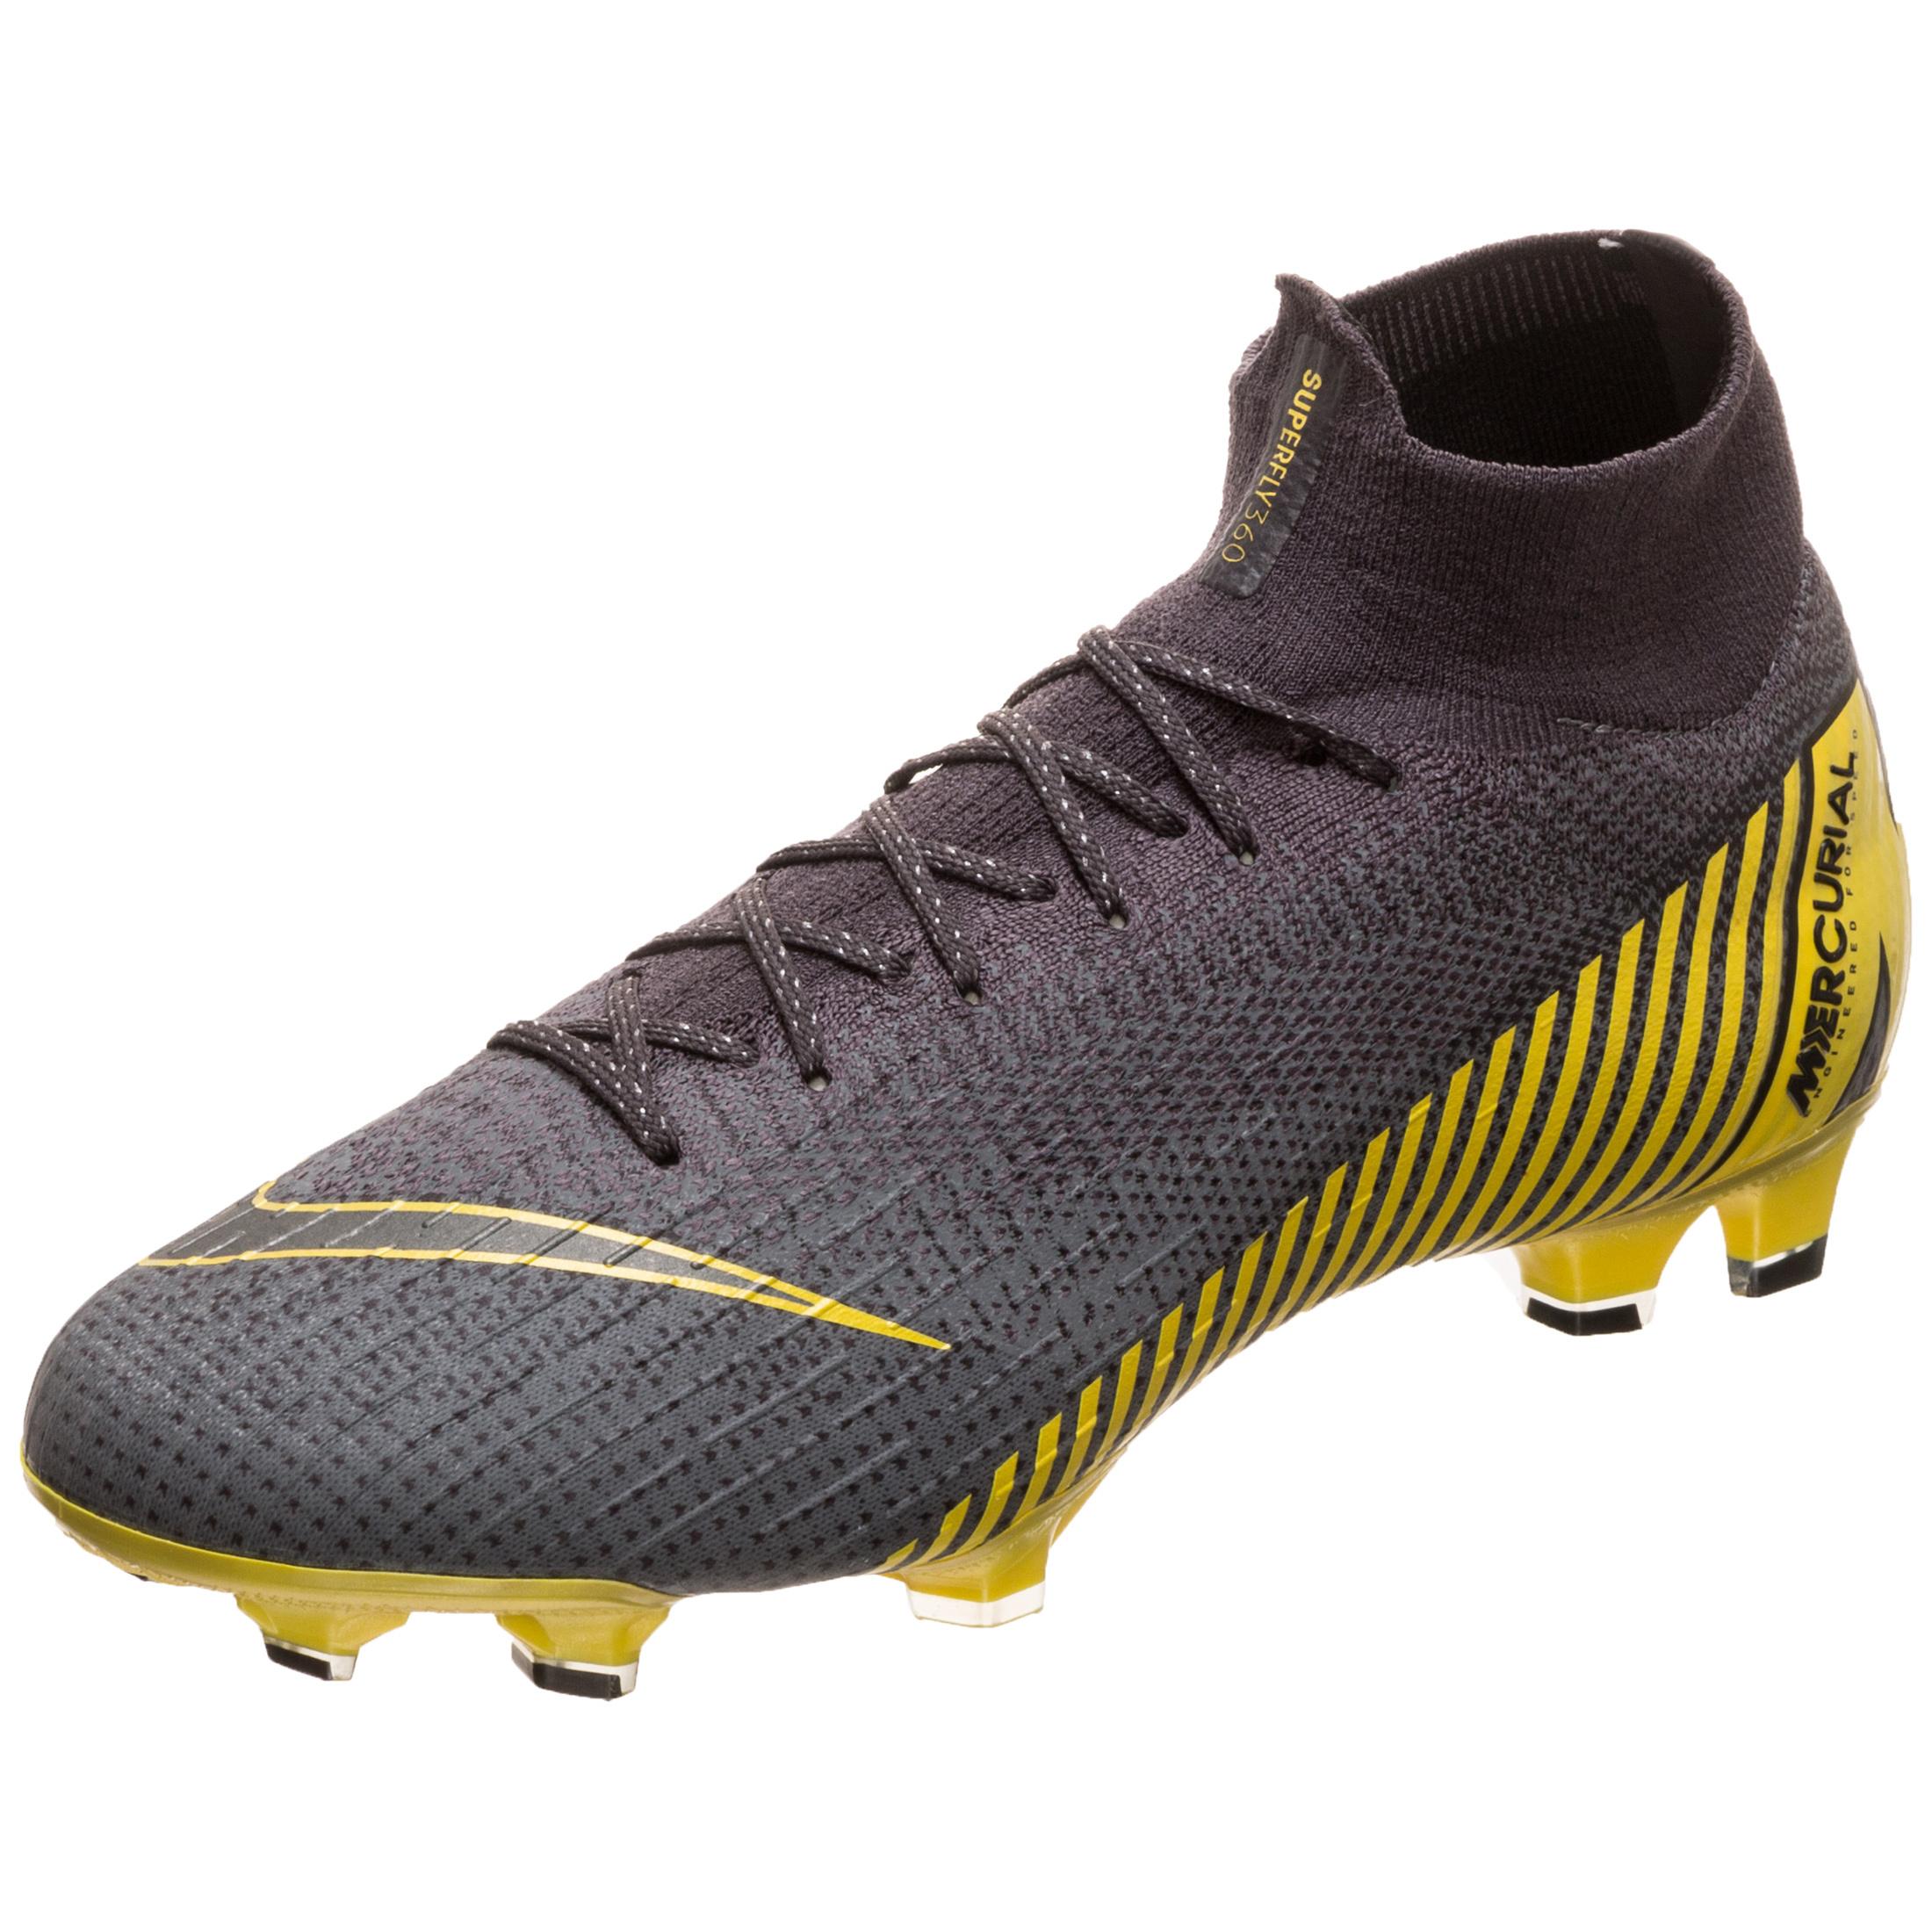 dc4cc4c1734 Nike Mercurial Football Boots